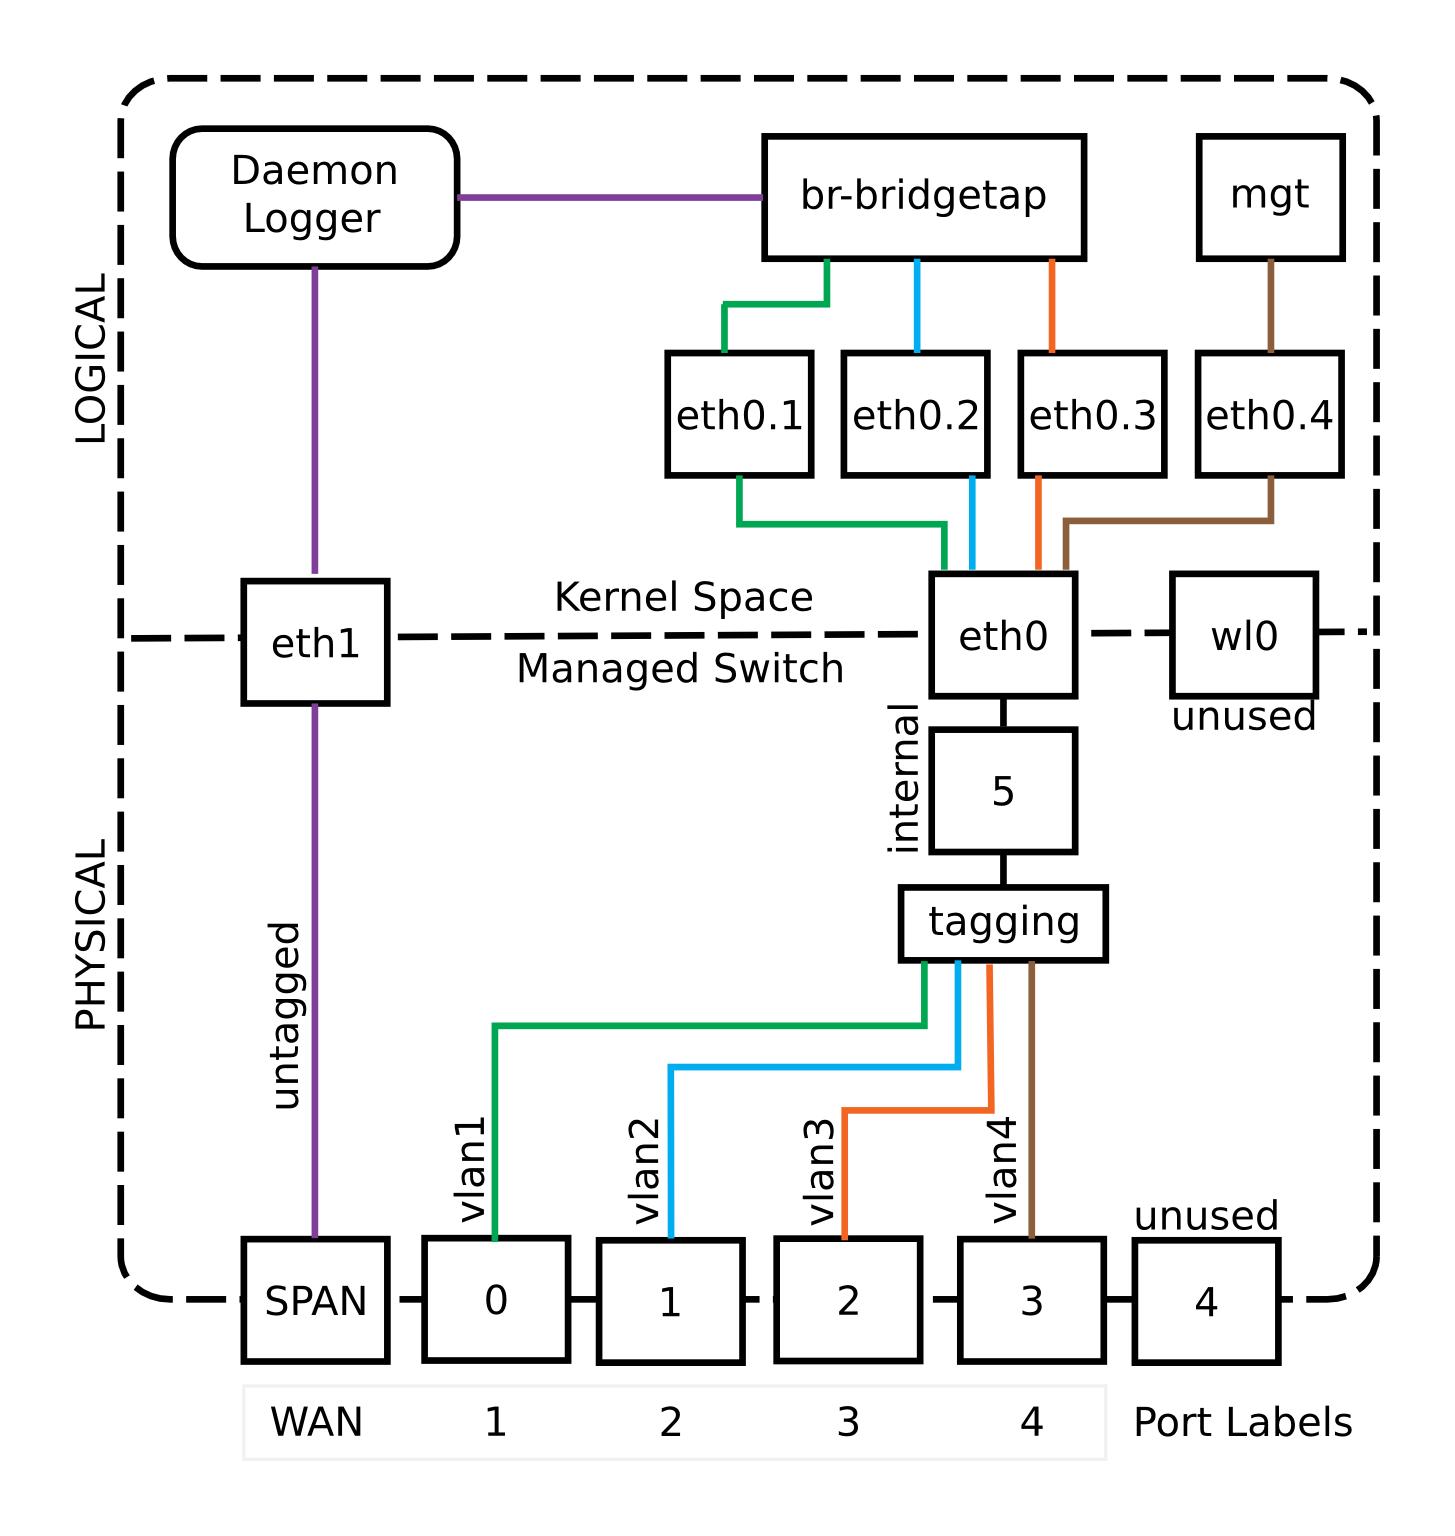 wrt54g diagram